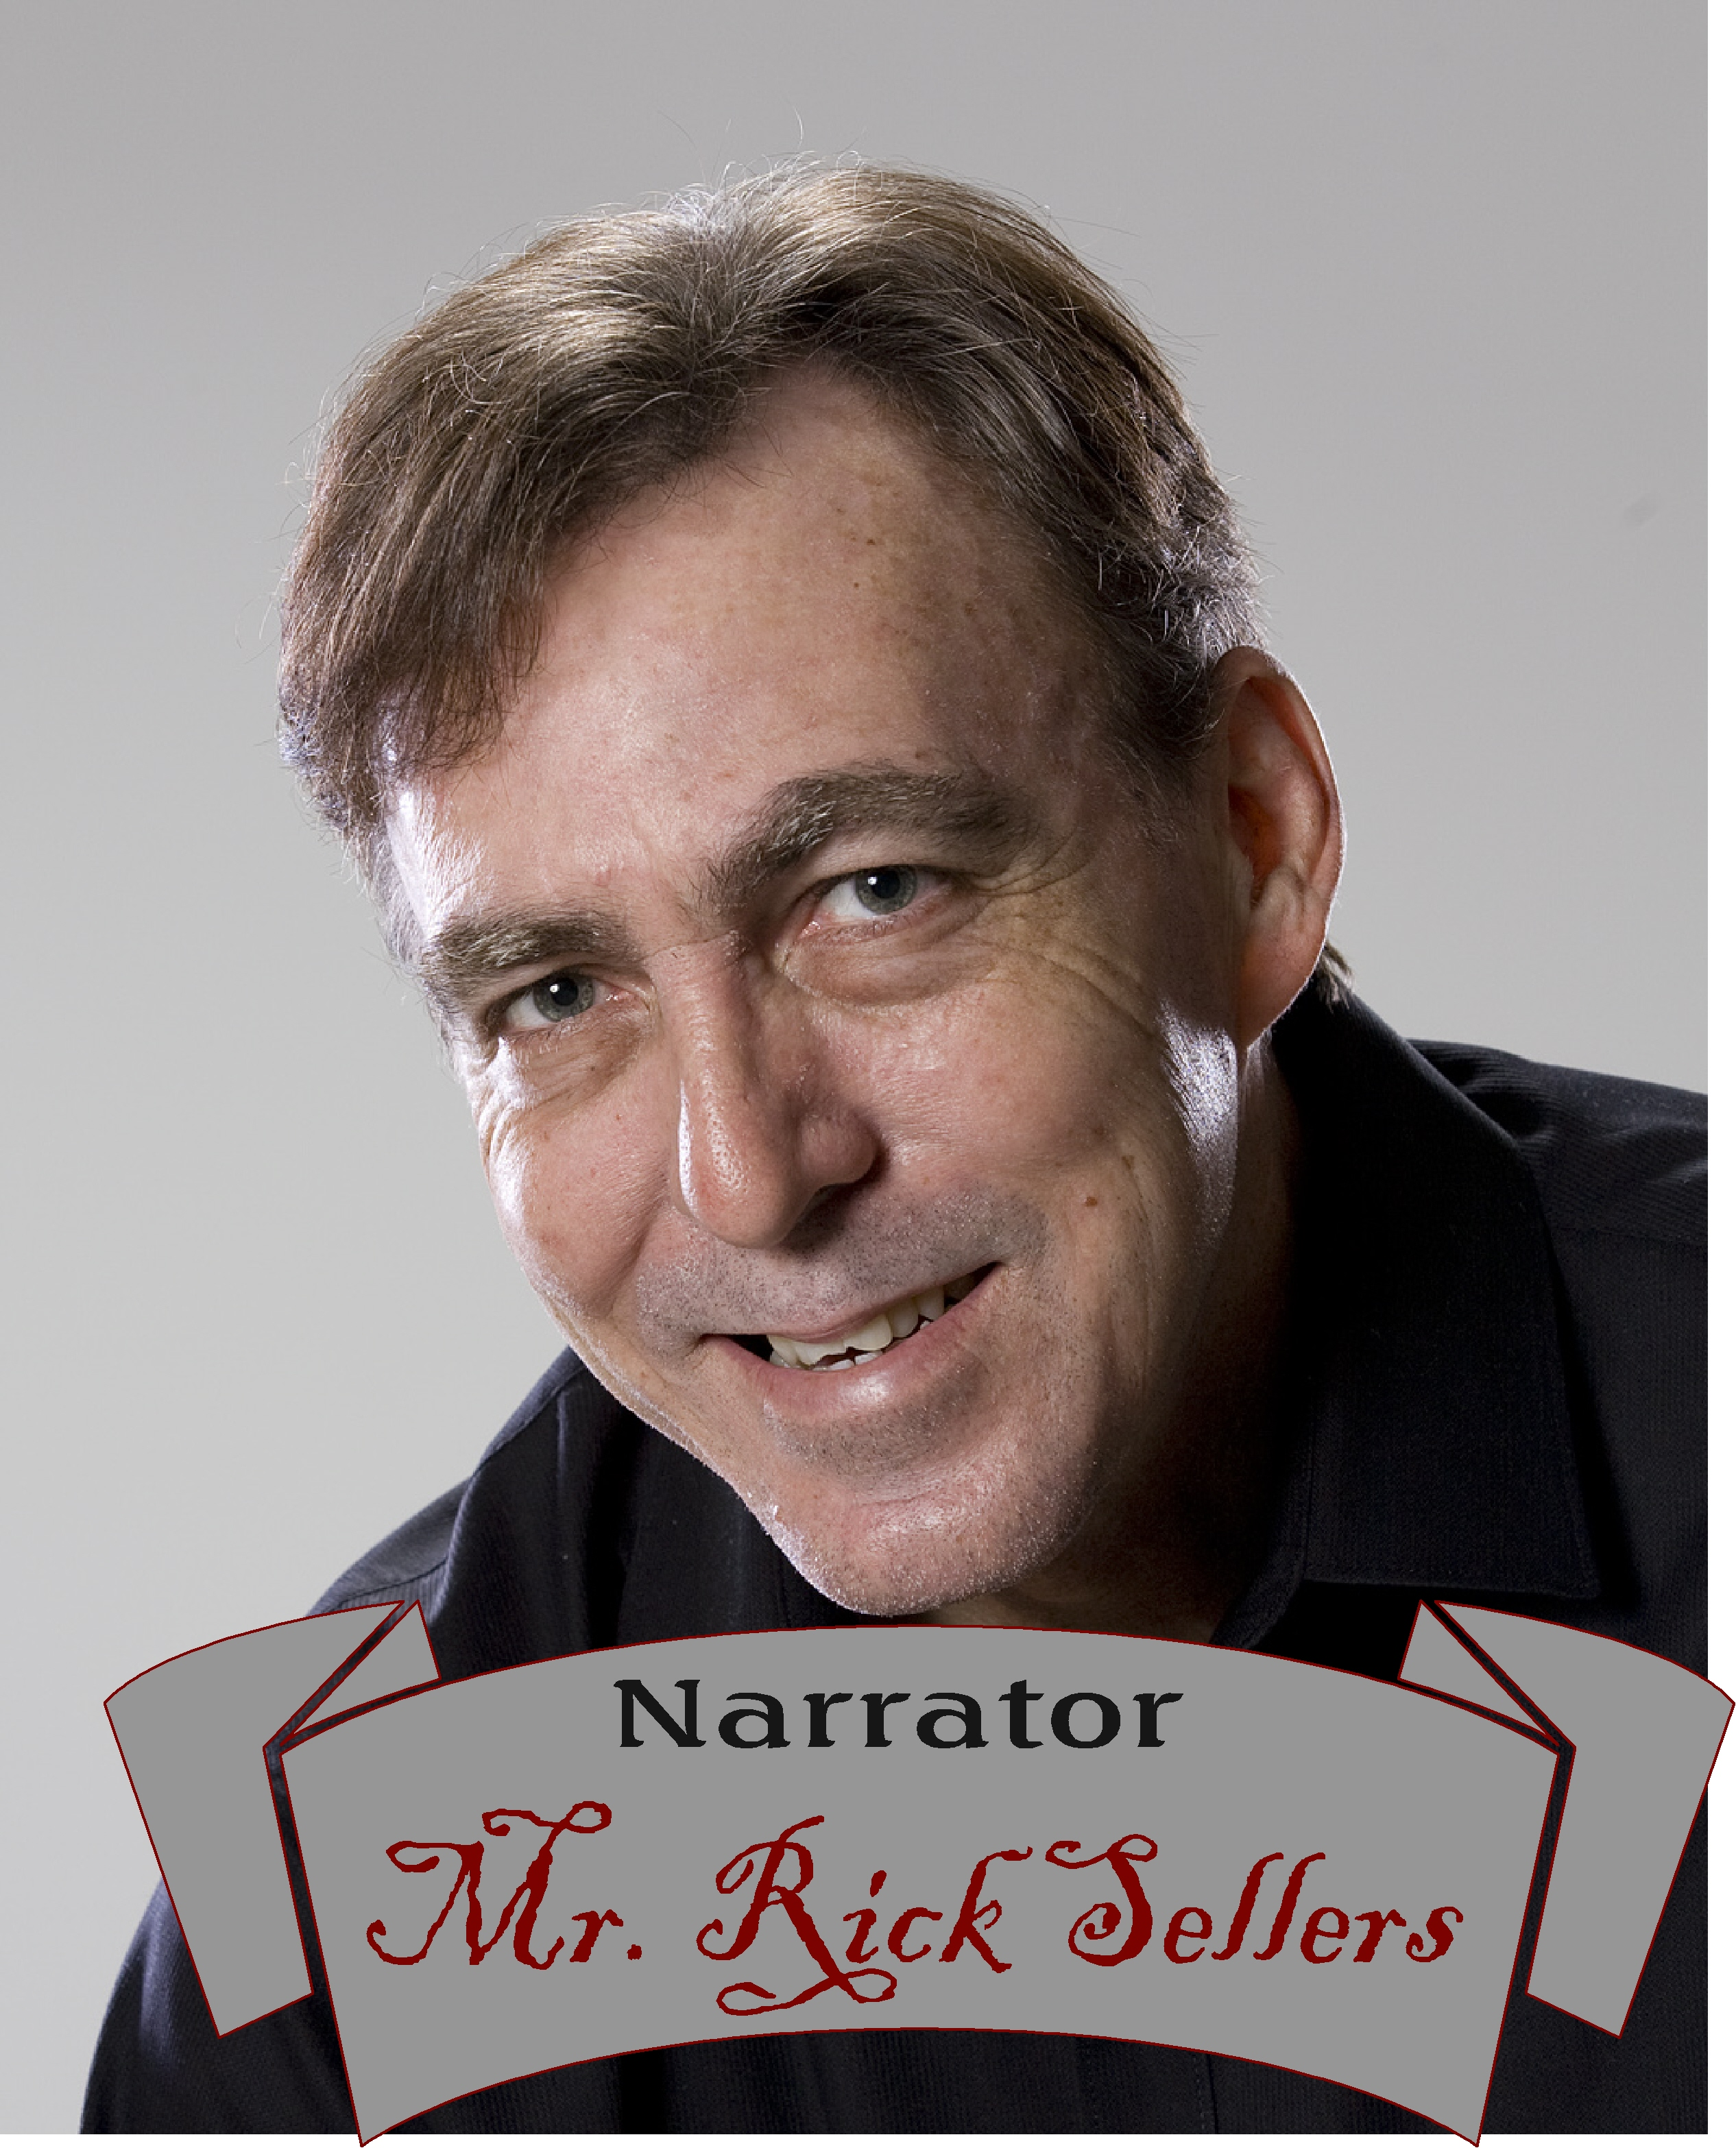 narrator-rick-sellers.jpg